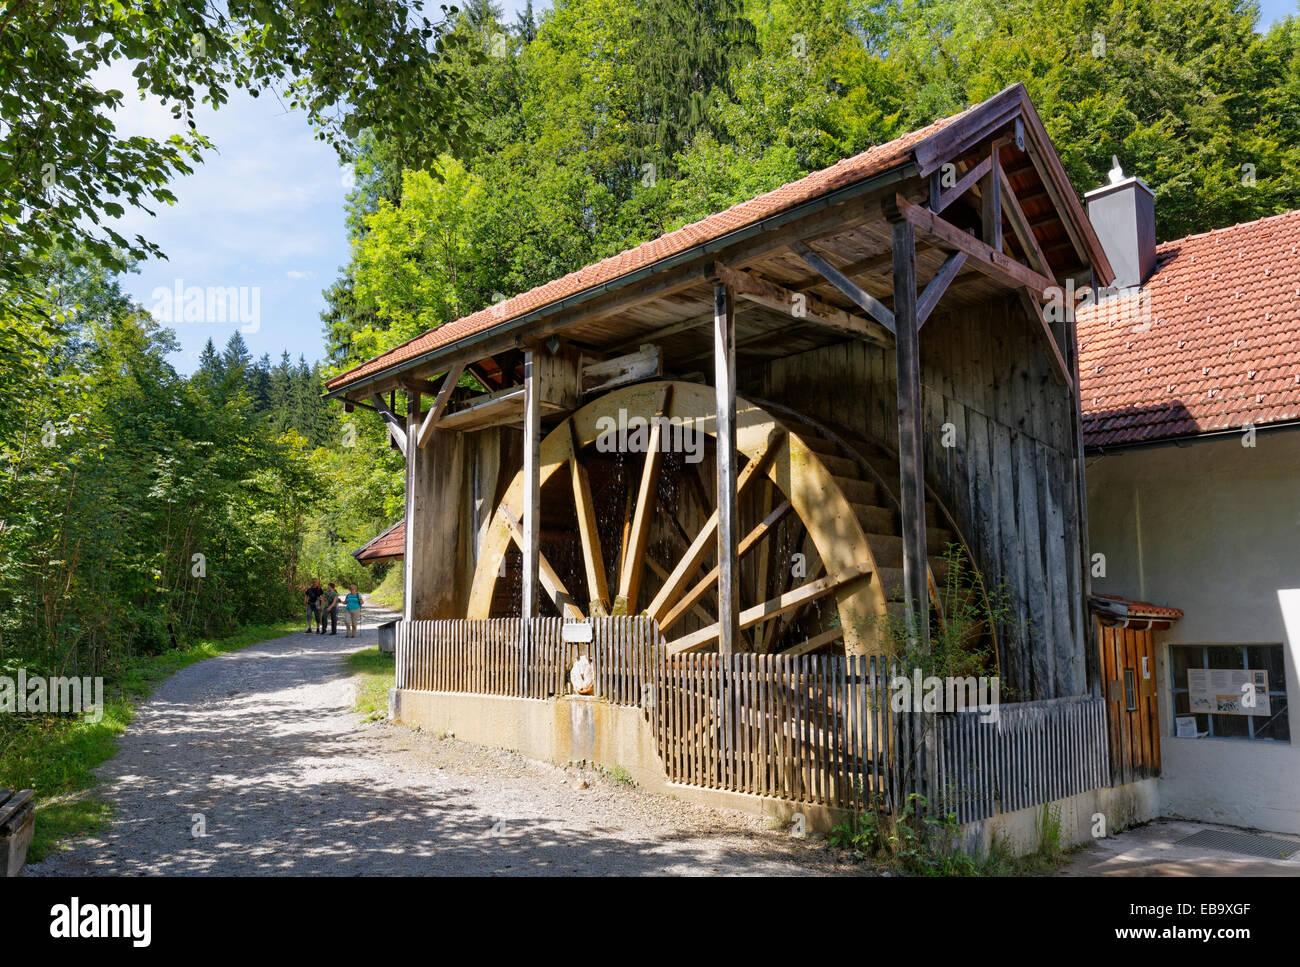 Water wheel at Bleier Sag on Gießenbach stream, Kiefersfelden, Mangfall Mountains, Upper Bavaria, Bavaria, - Stock Image